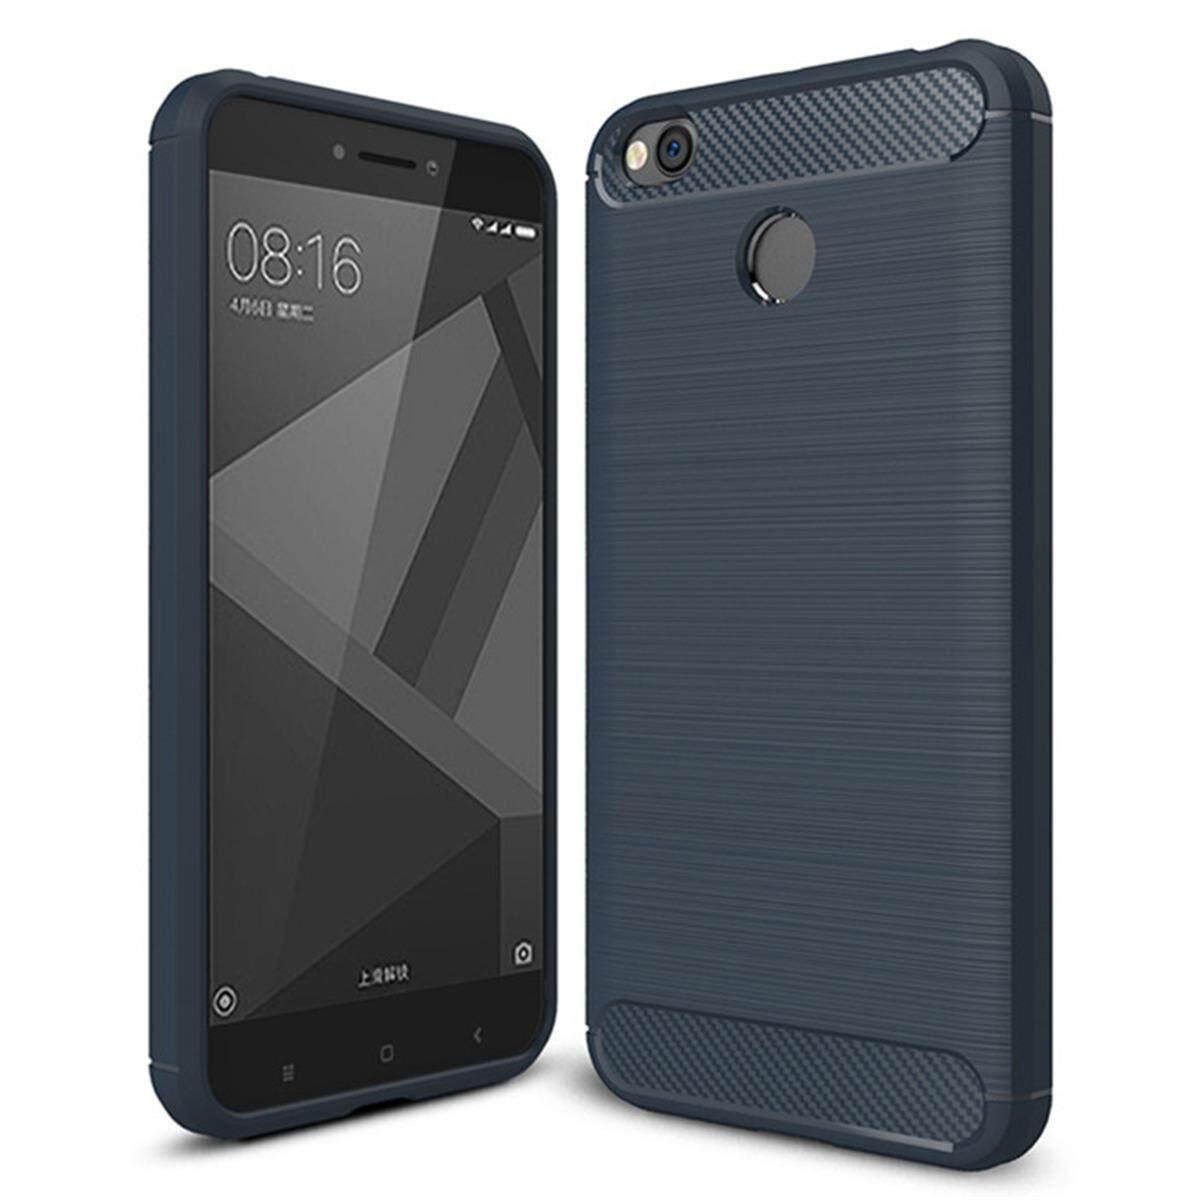 Hình ảnh for Xiaomi Redmi 4X Case Carbon Fibre Hairline Ultrathin Soft TPU Back Case Cover, Light, Minimalist, Non-slip, Shockproof, Anti-scratch